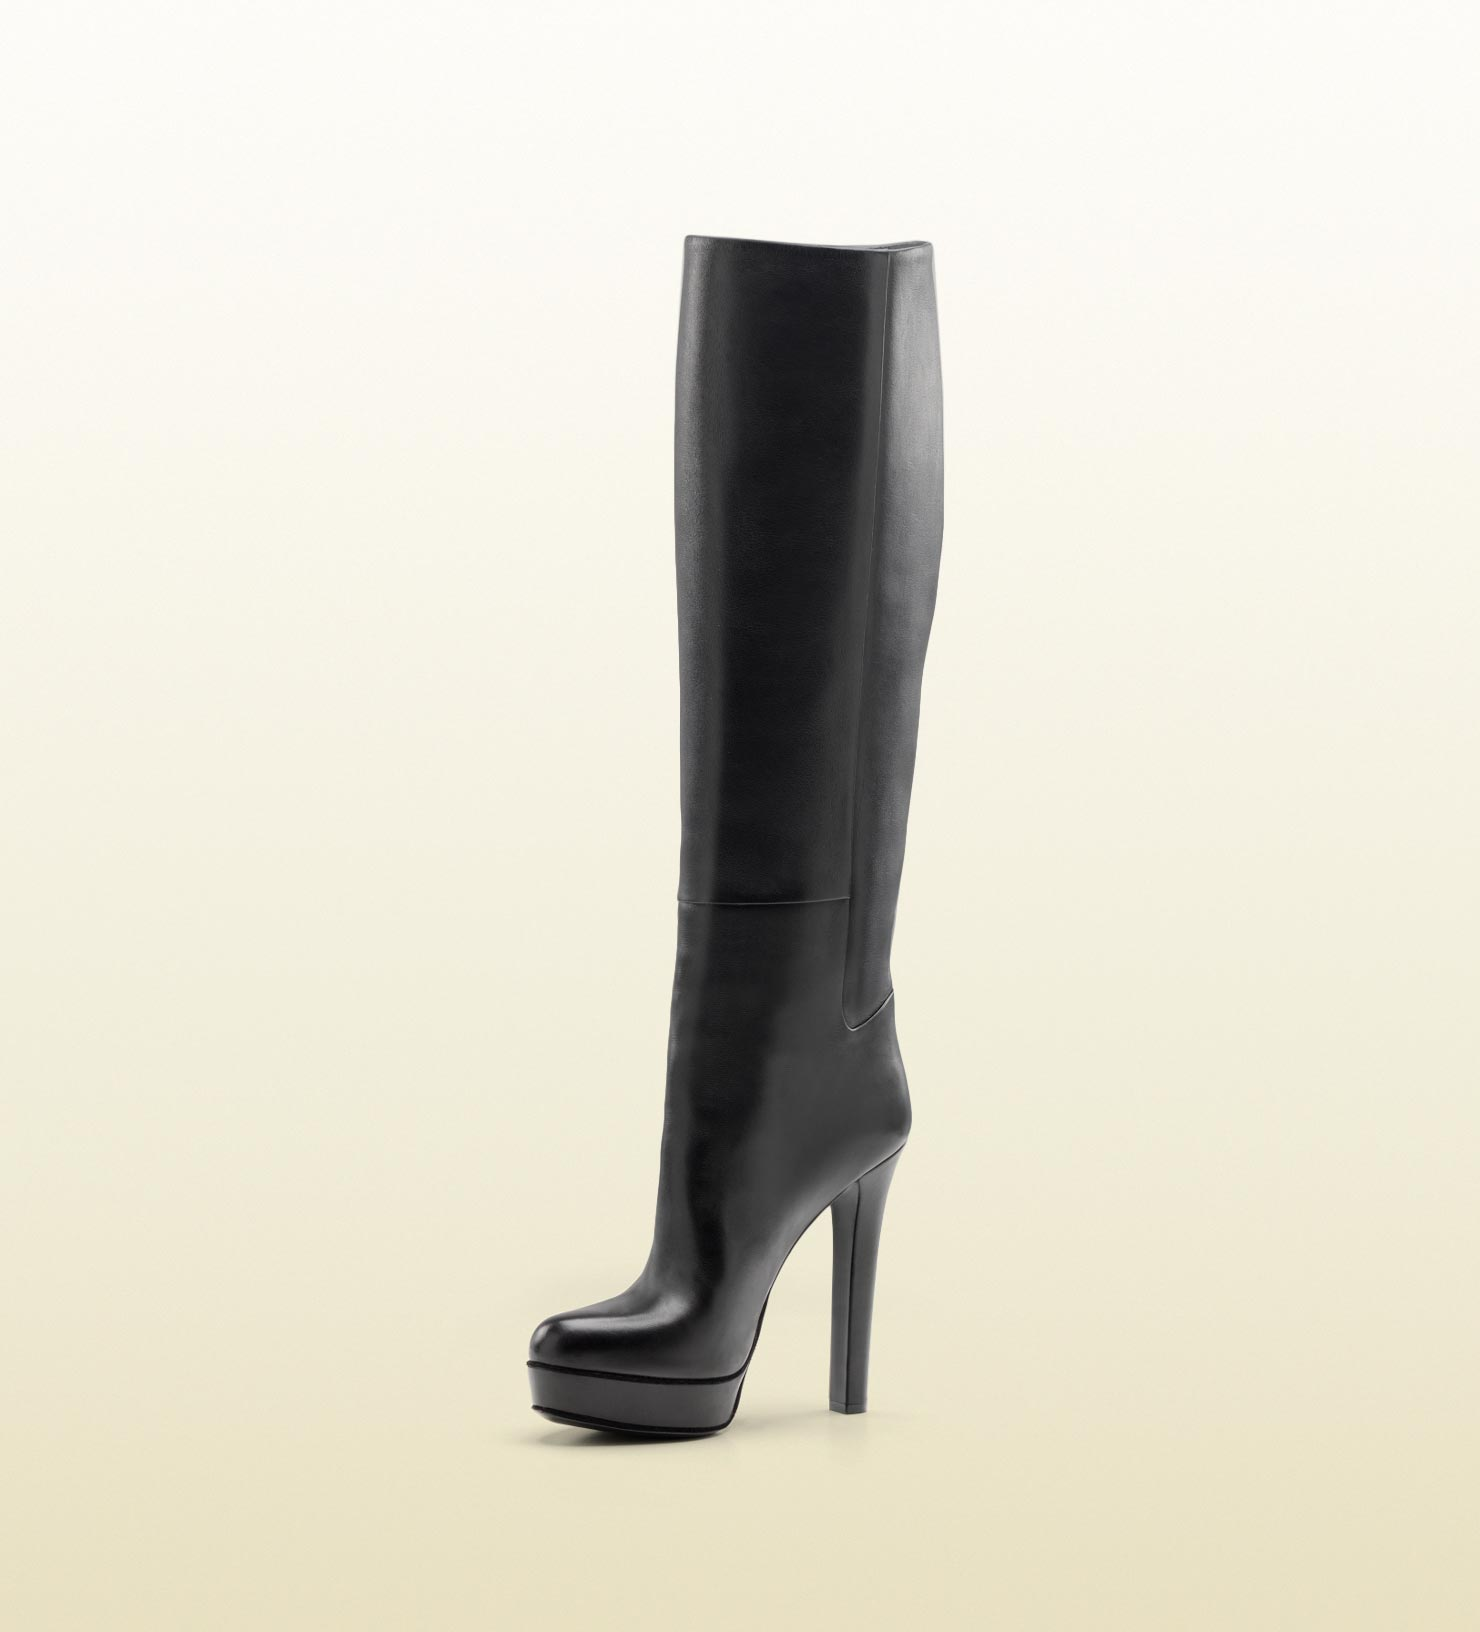 c73f811ea154 Lyst - Gucci Alexa High Heel Platform Boot in Black